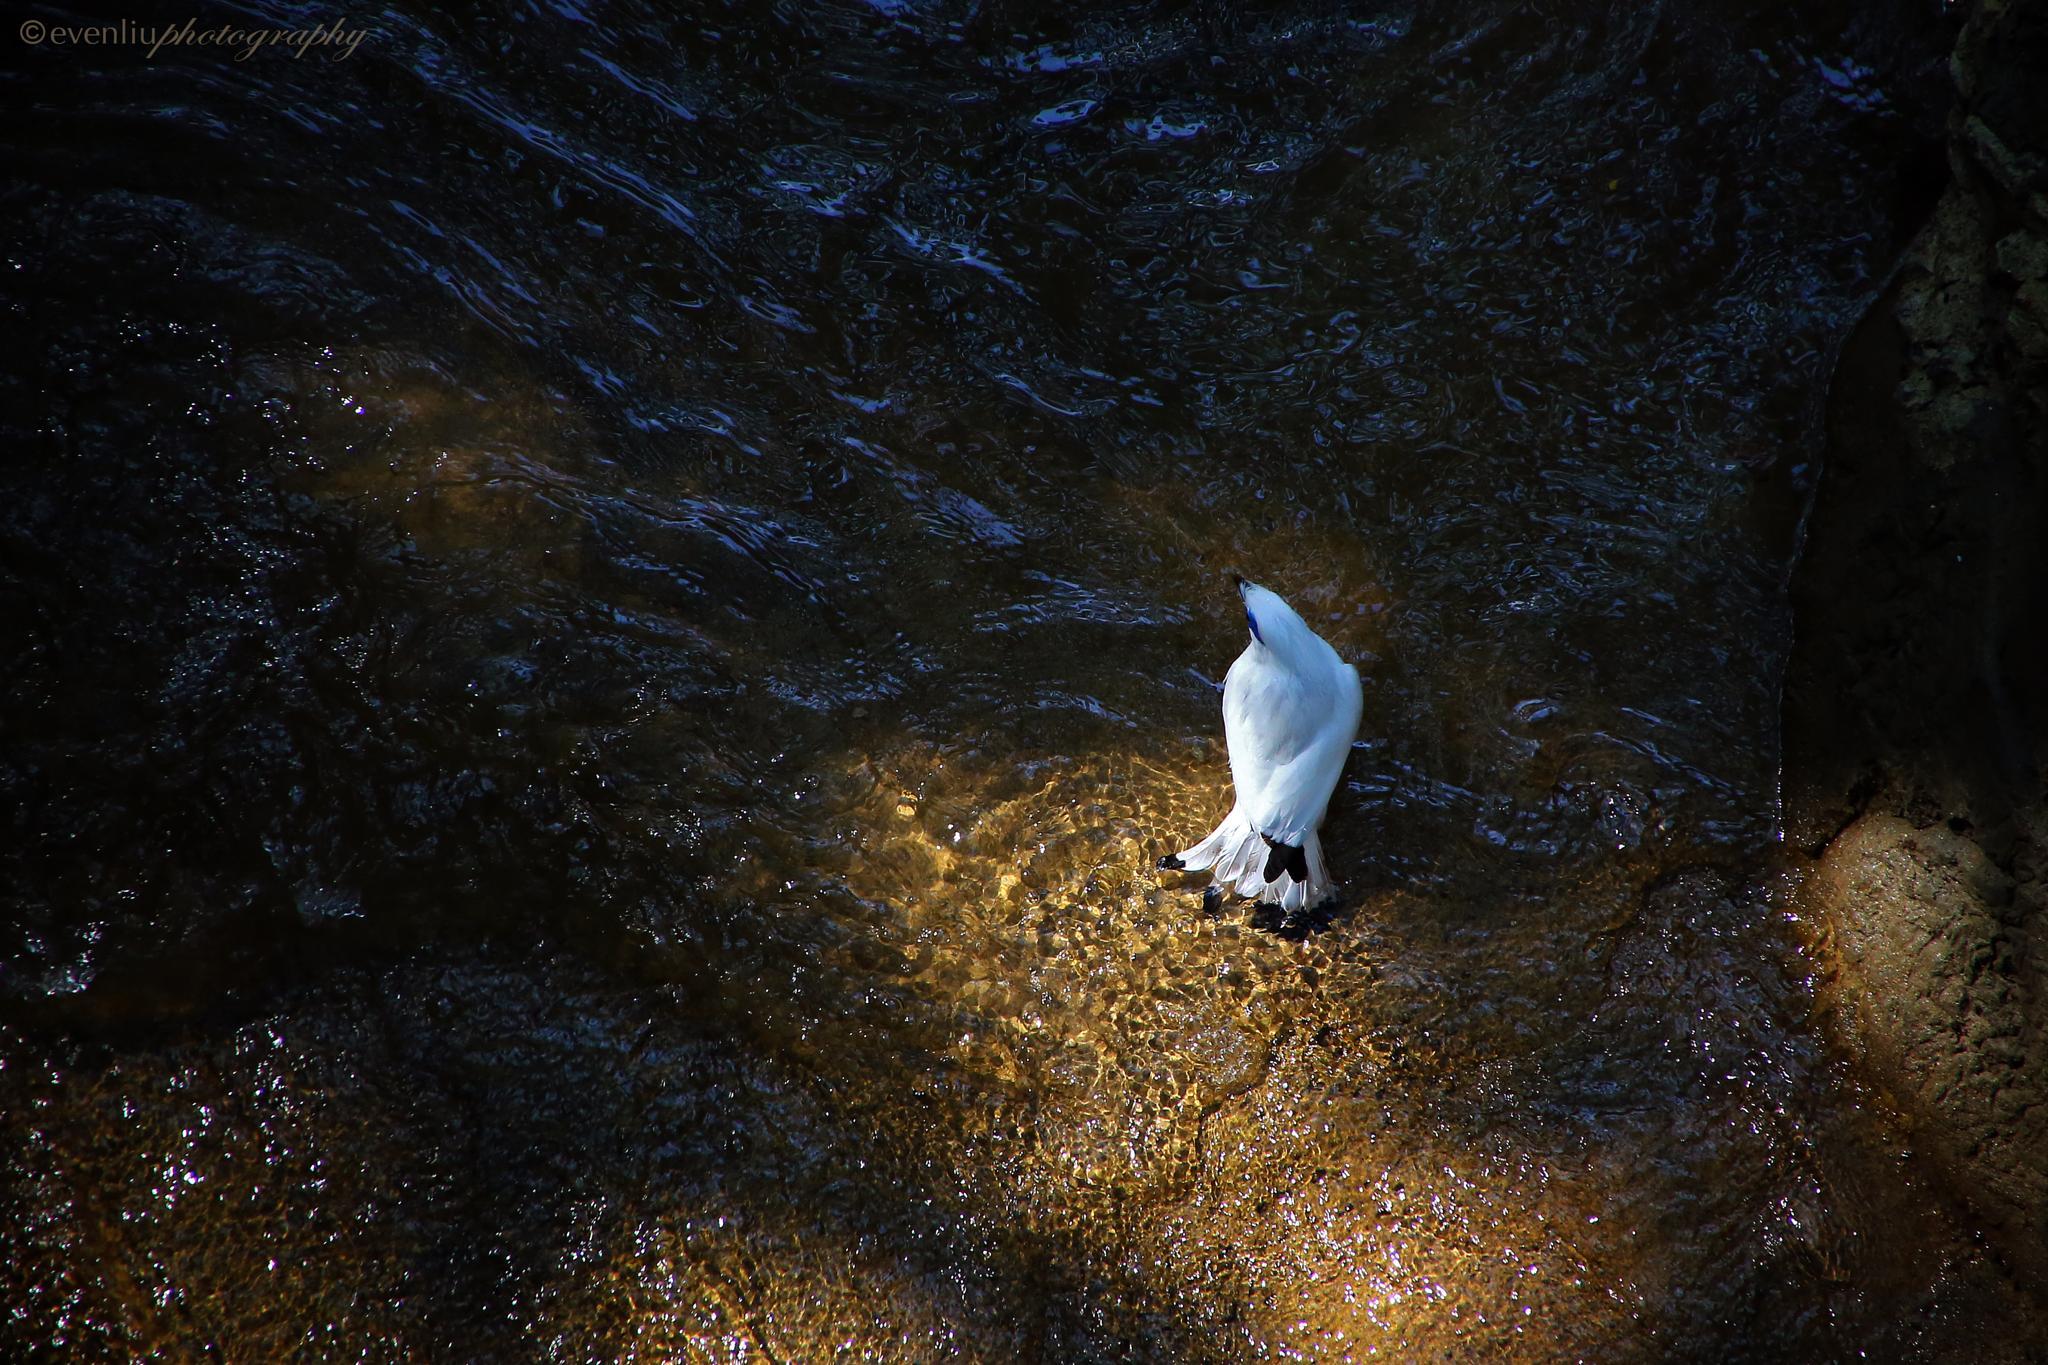 the bird by EvenLiu